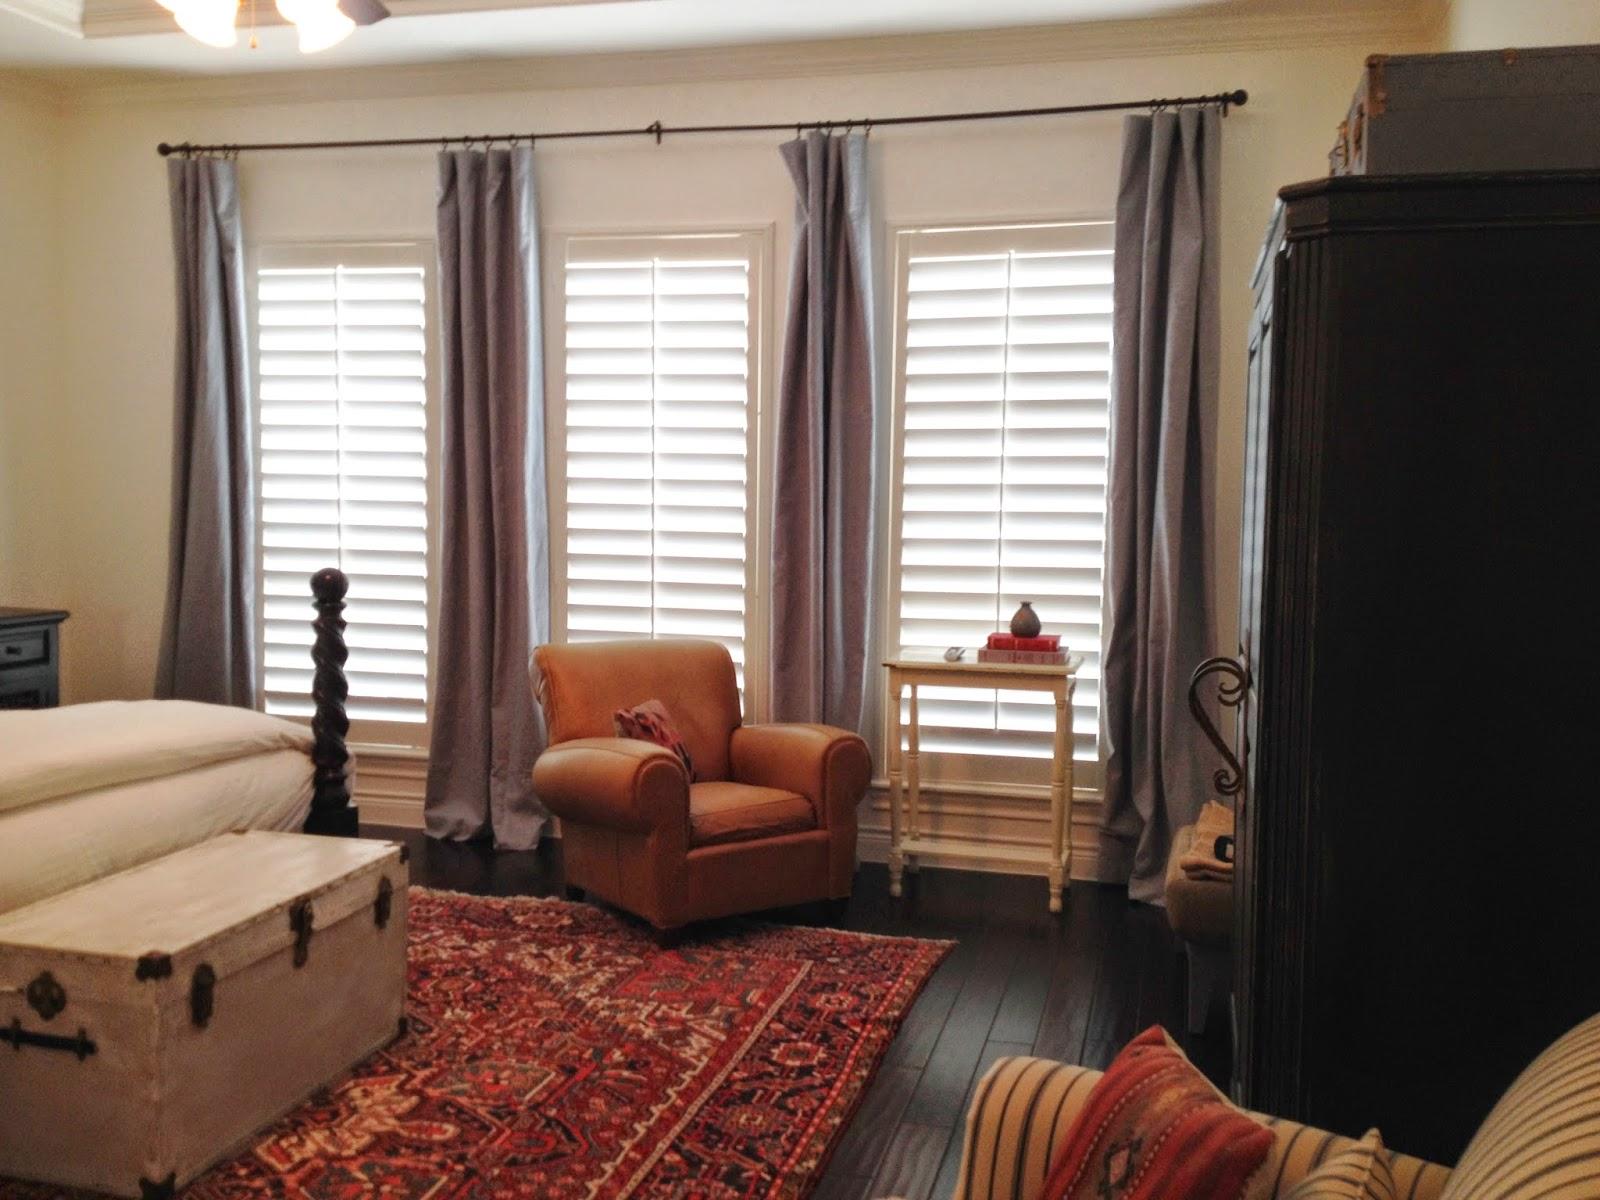 pin drape teal drapes pier decor curtain peyton pinterest whitley imports pottery barn